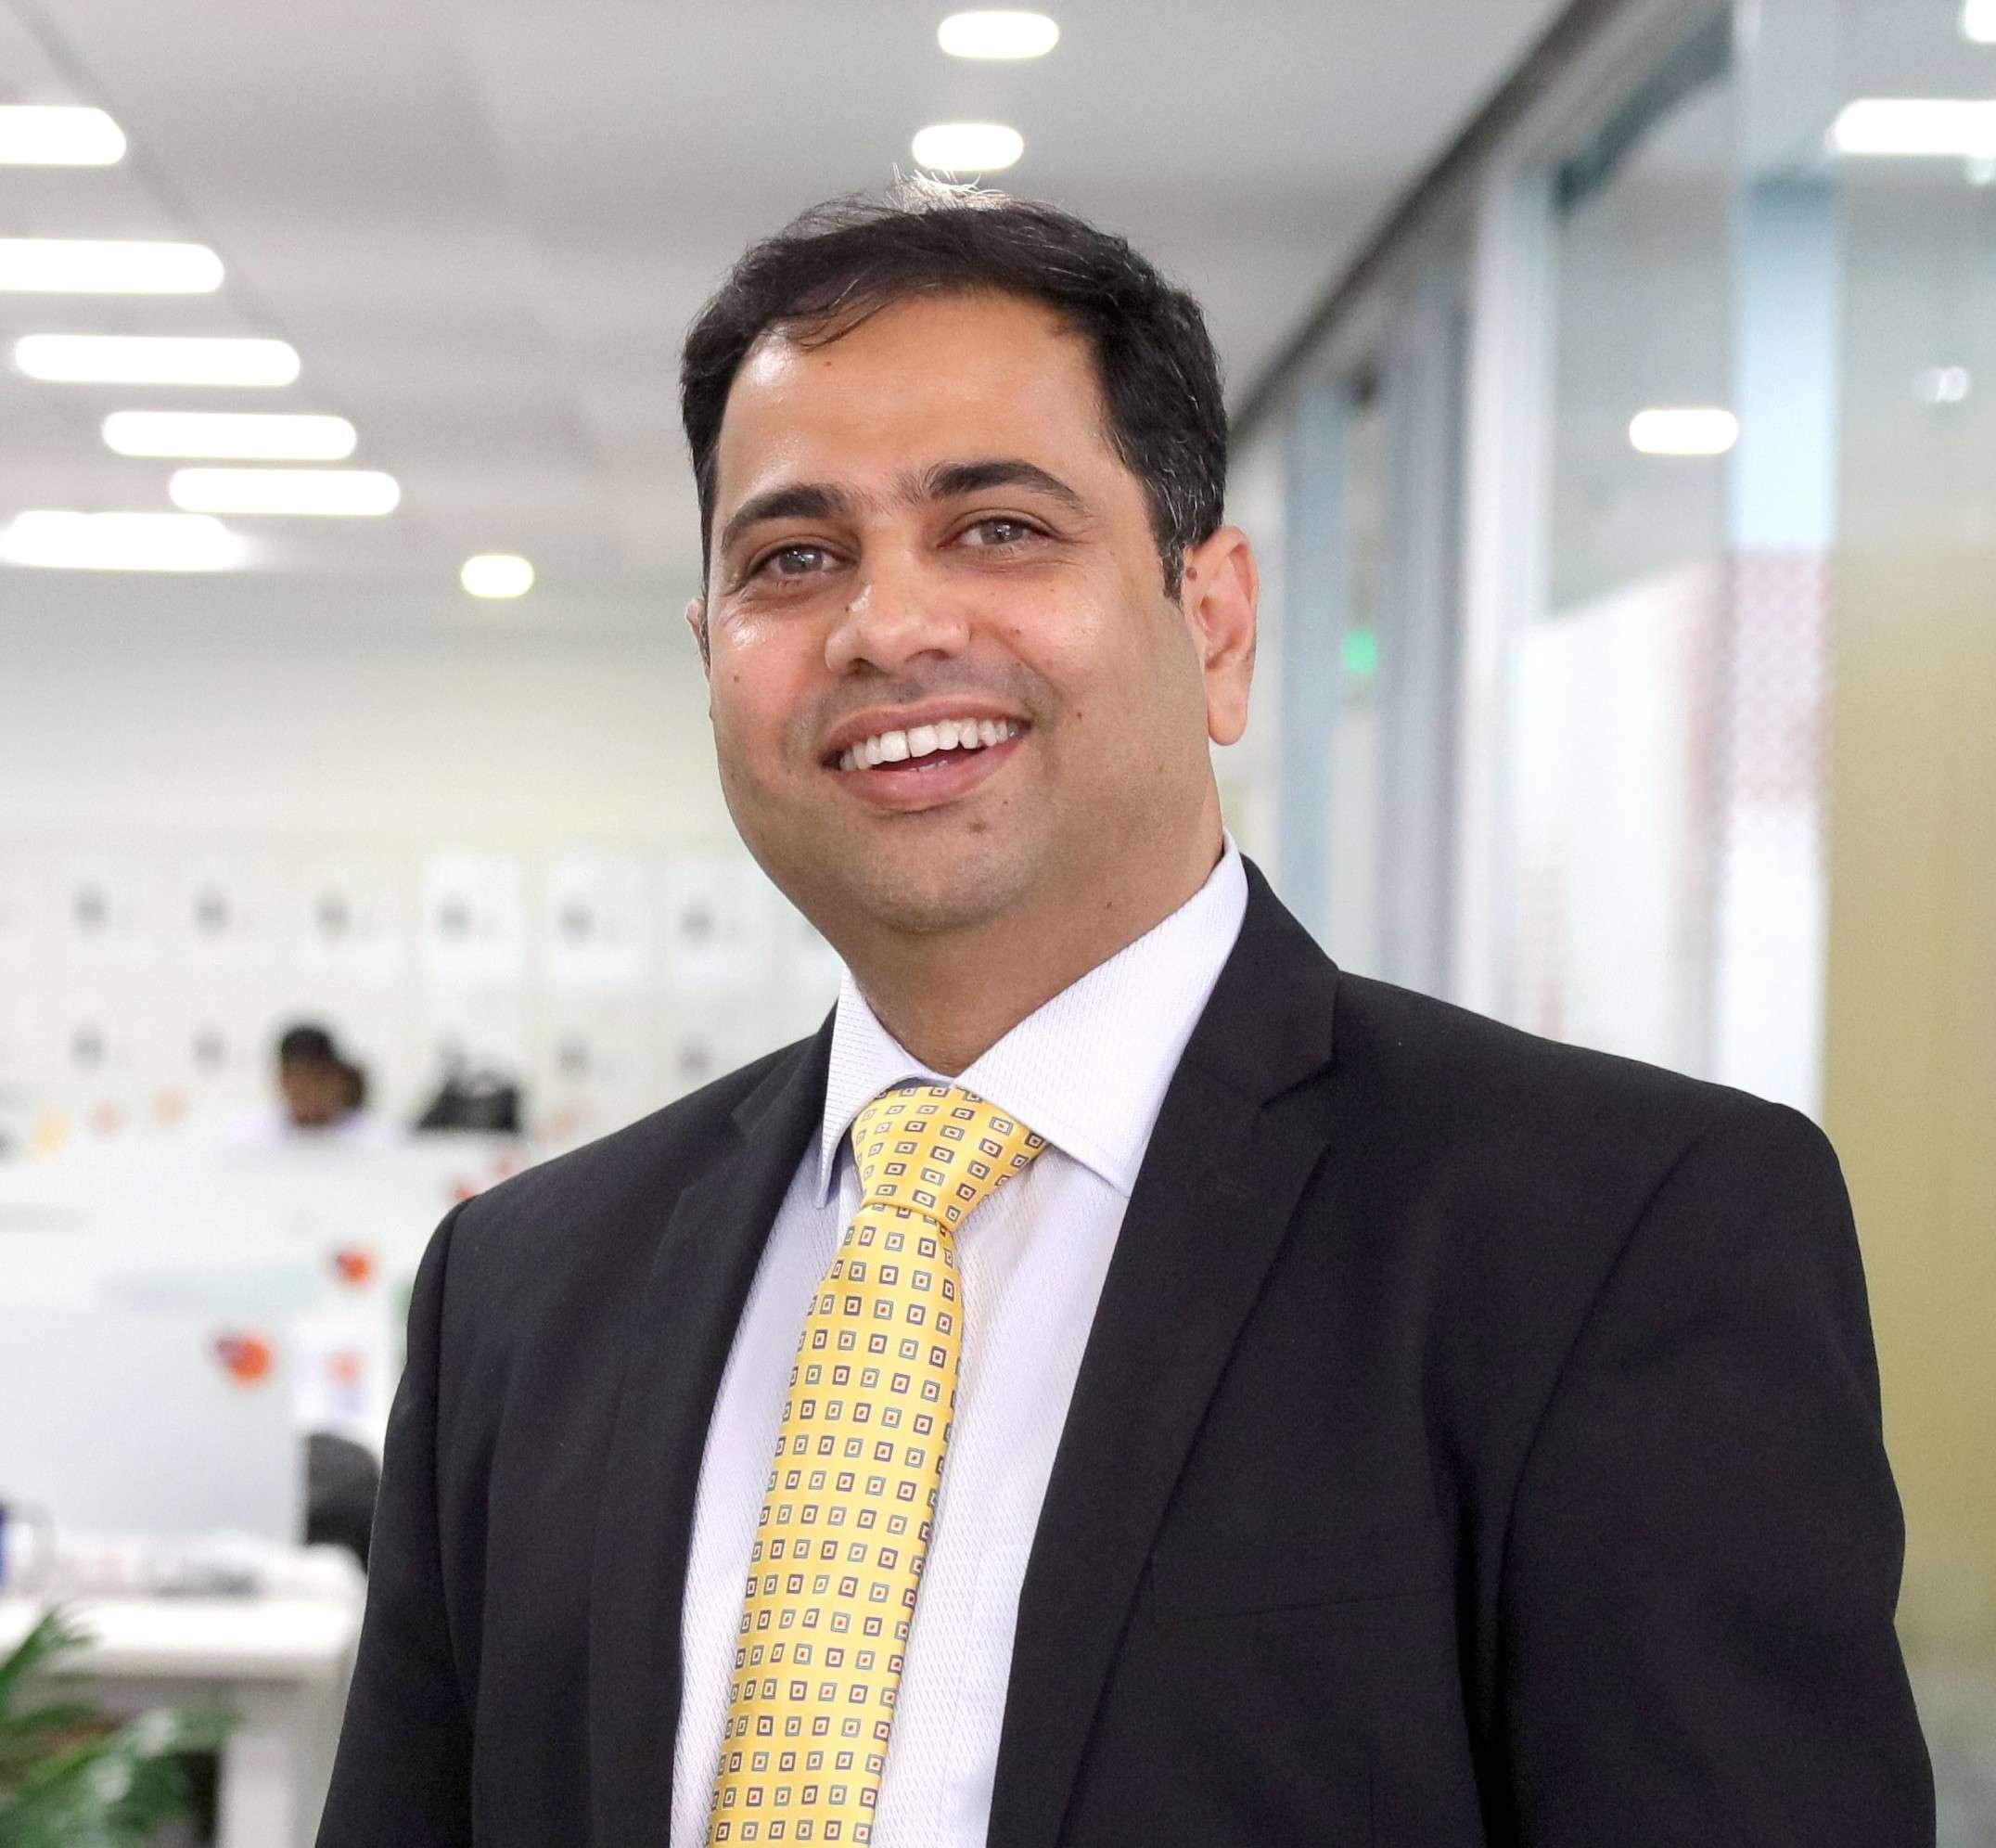 Siemens Healthcare appoints Vivek Kanade as new MD